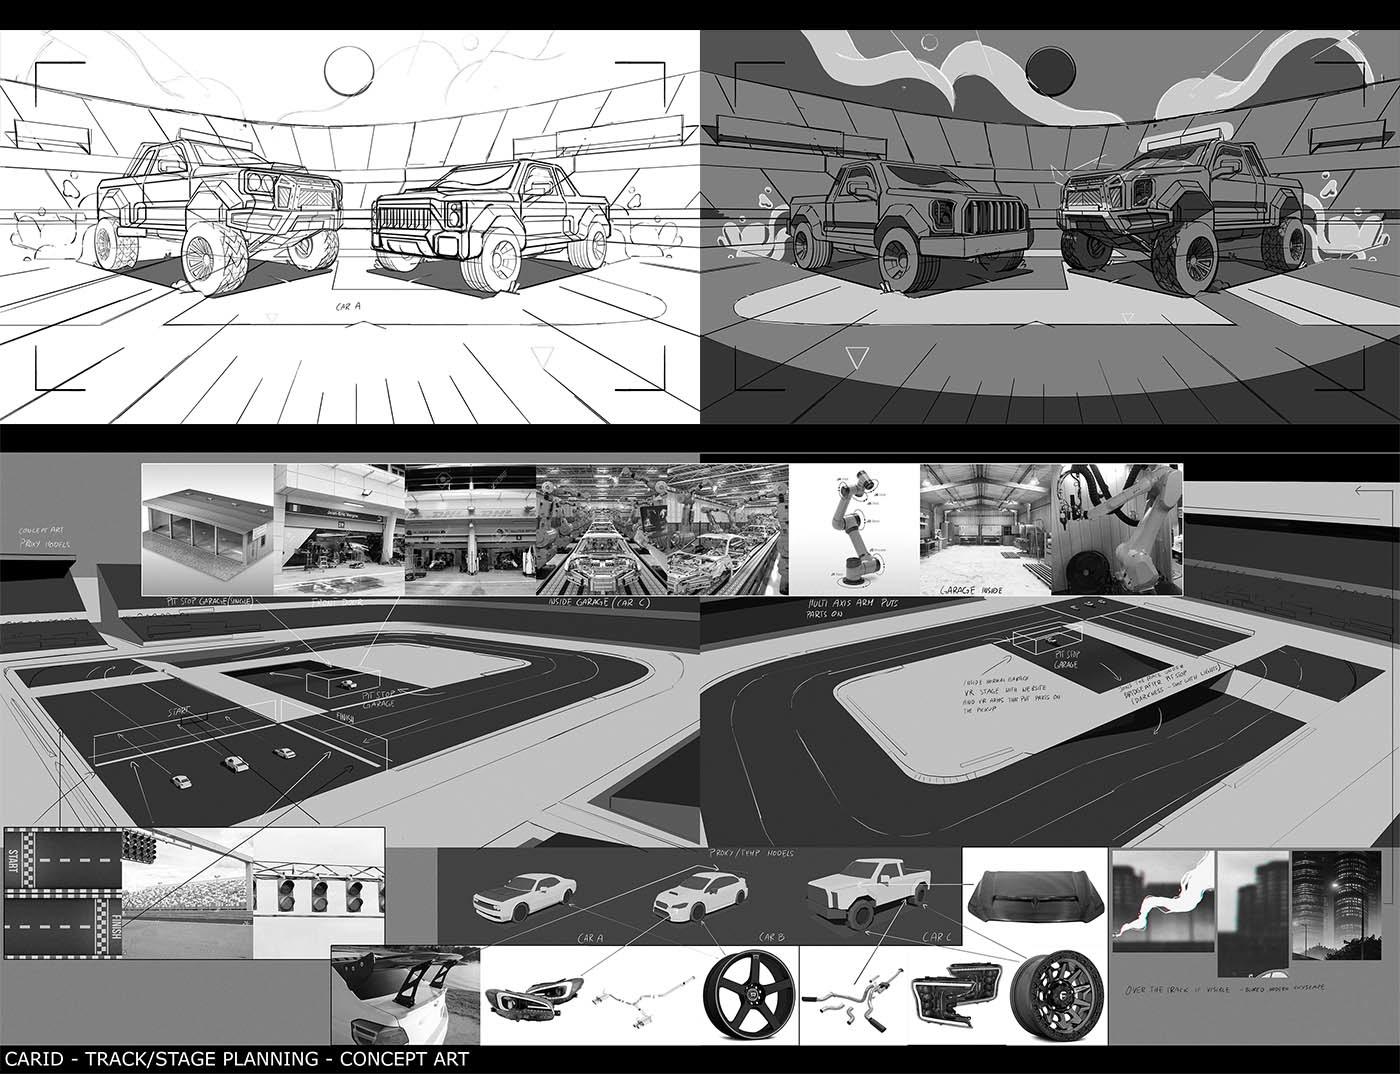 Image may contain: drawing, cartoon and illustration